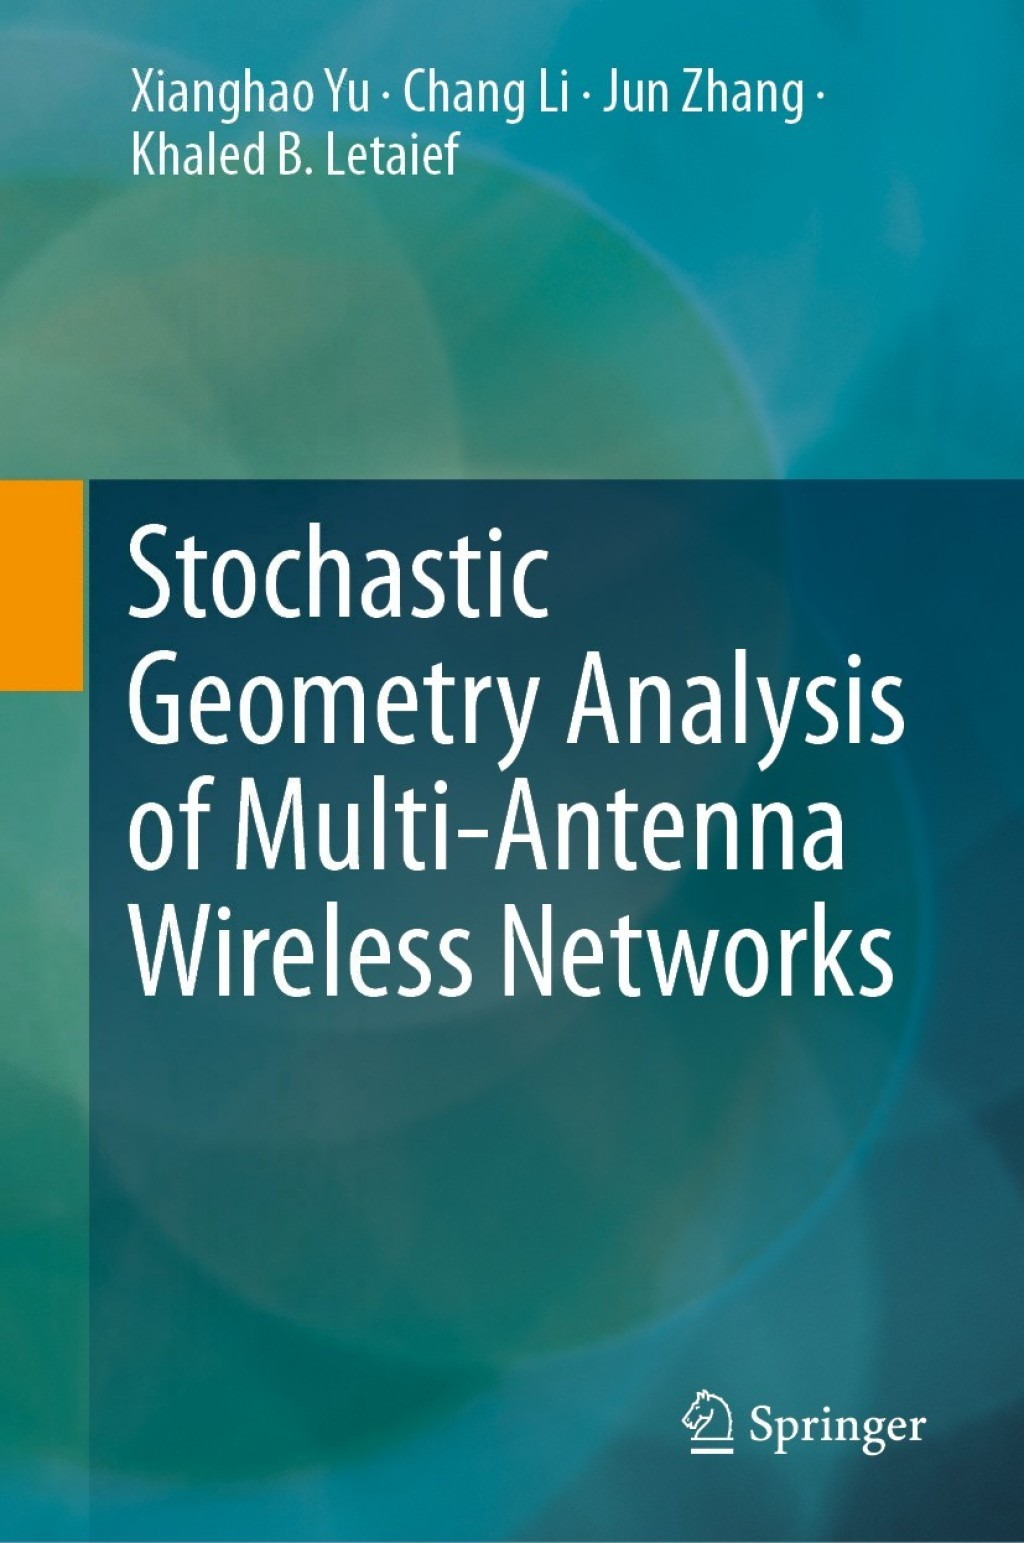 Stochastic Geometry Analysis of Multi-Antenna Wireless Networks (eBook) (9789811358807) photo